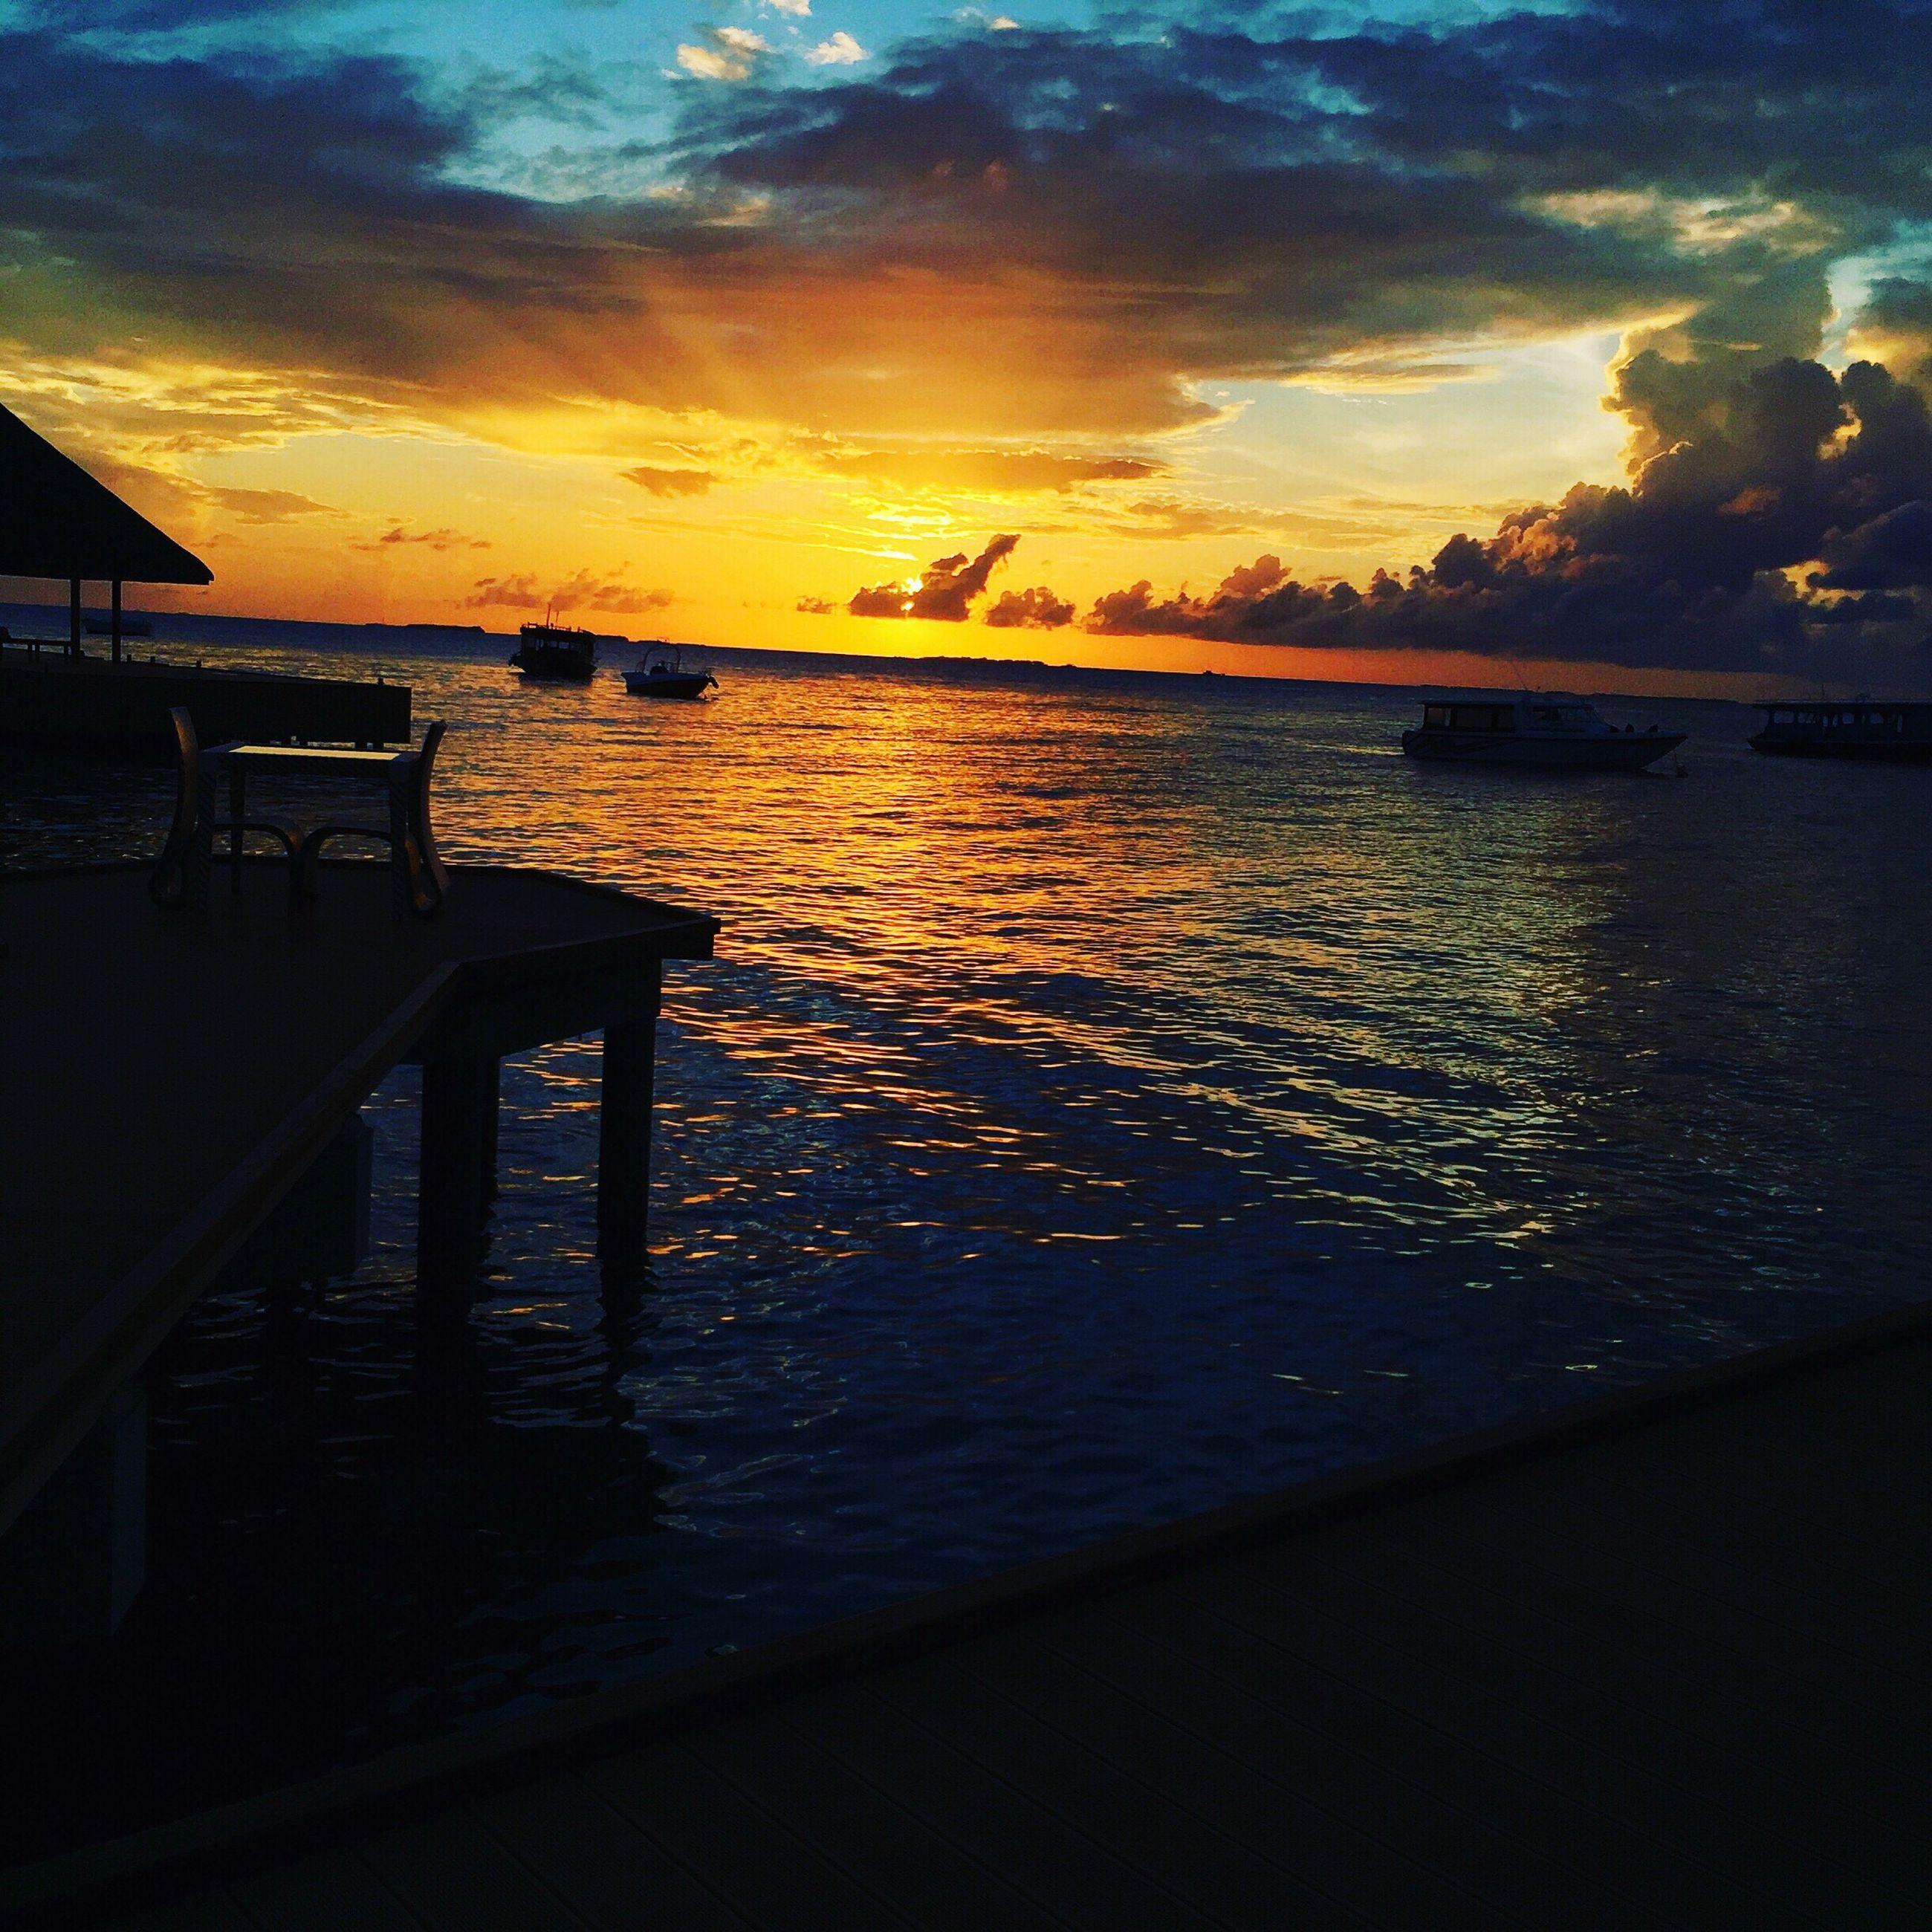 sunset, water, scenics, tranquil scene, sea, tranquility, idyllic, orange color, beauty in nature, sky, reflection, cloud - sky, pier, dramatic sky, rippled, nature, cloud, remote, moody sky, outdoors, calm, majestic, no people, ocean, romantic sky, coastline, non-urban scene